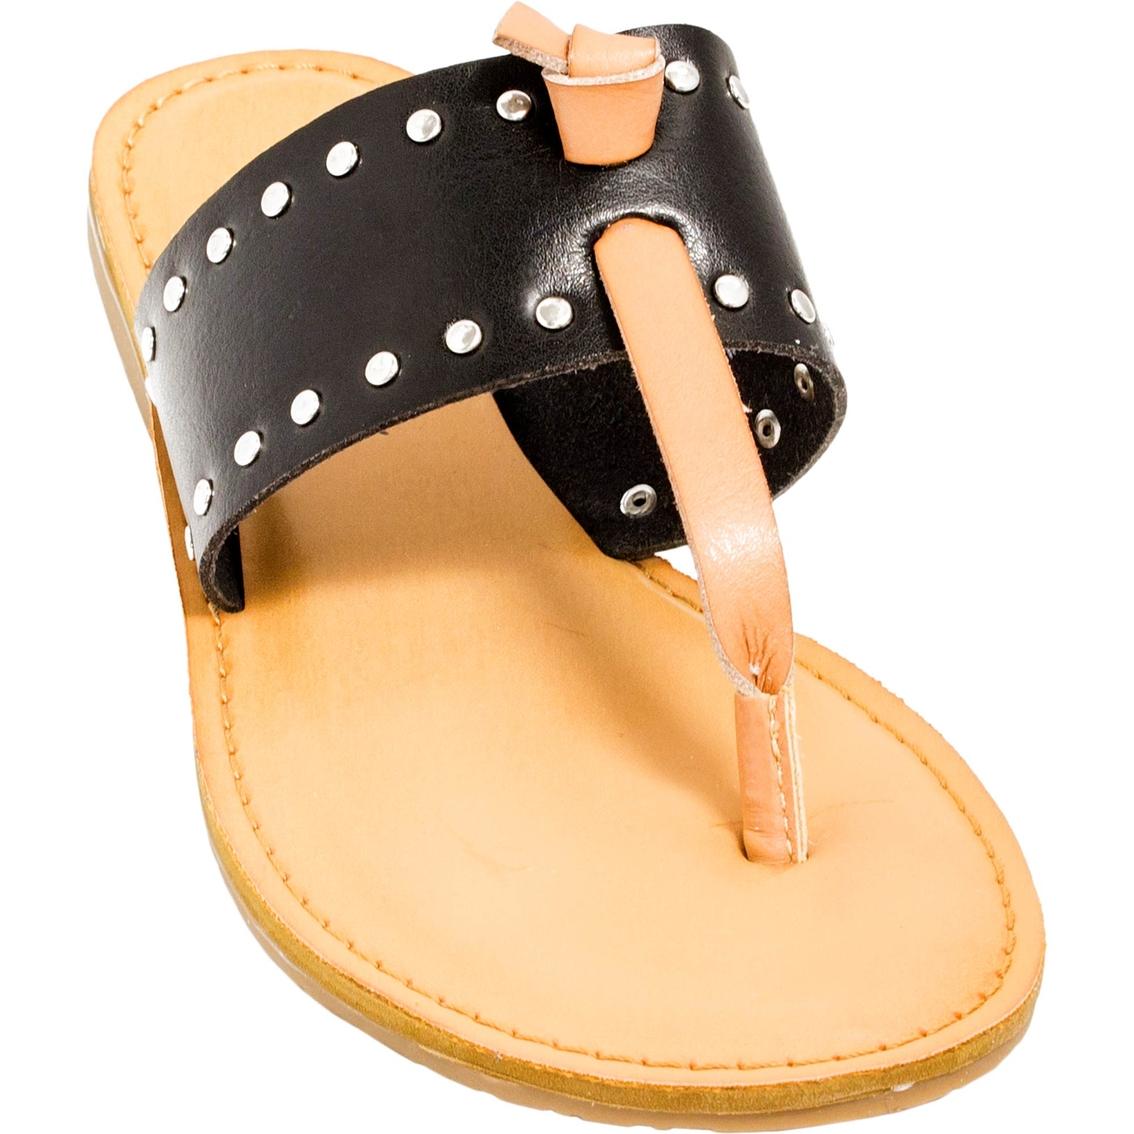 9e4952cf086 Rock   Candy Blaney Single Band Thong Sandal